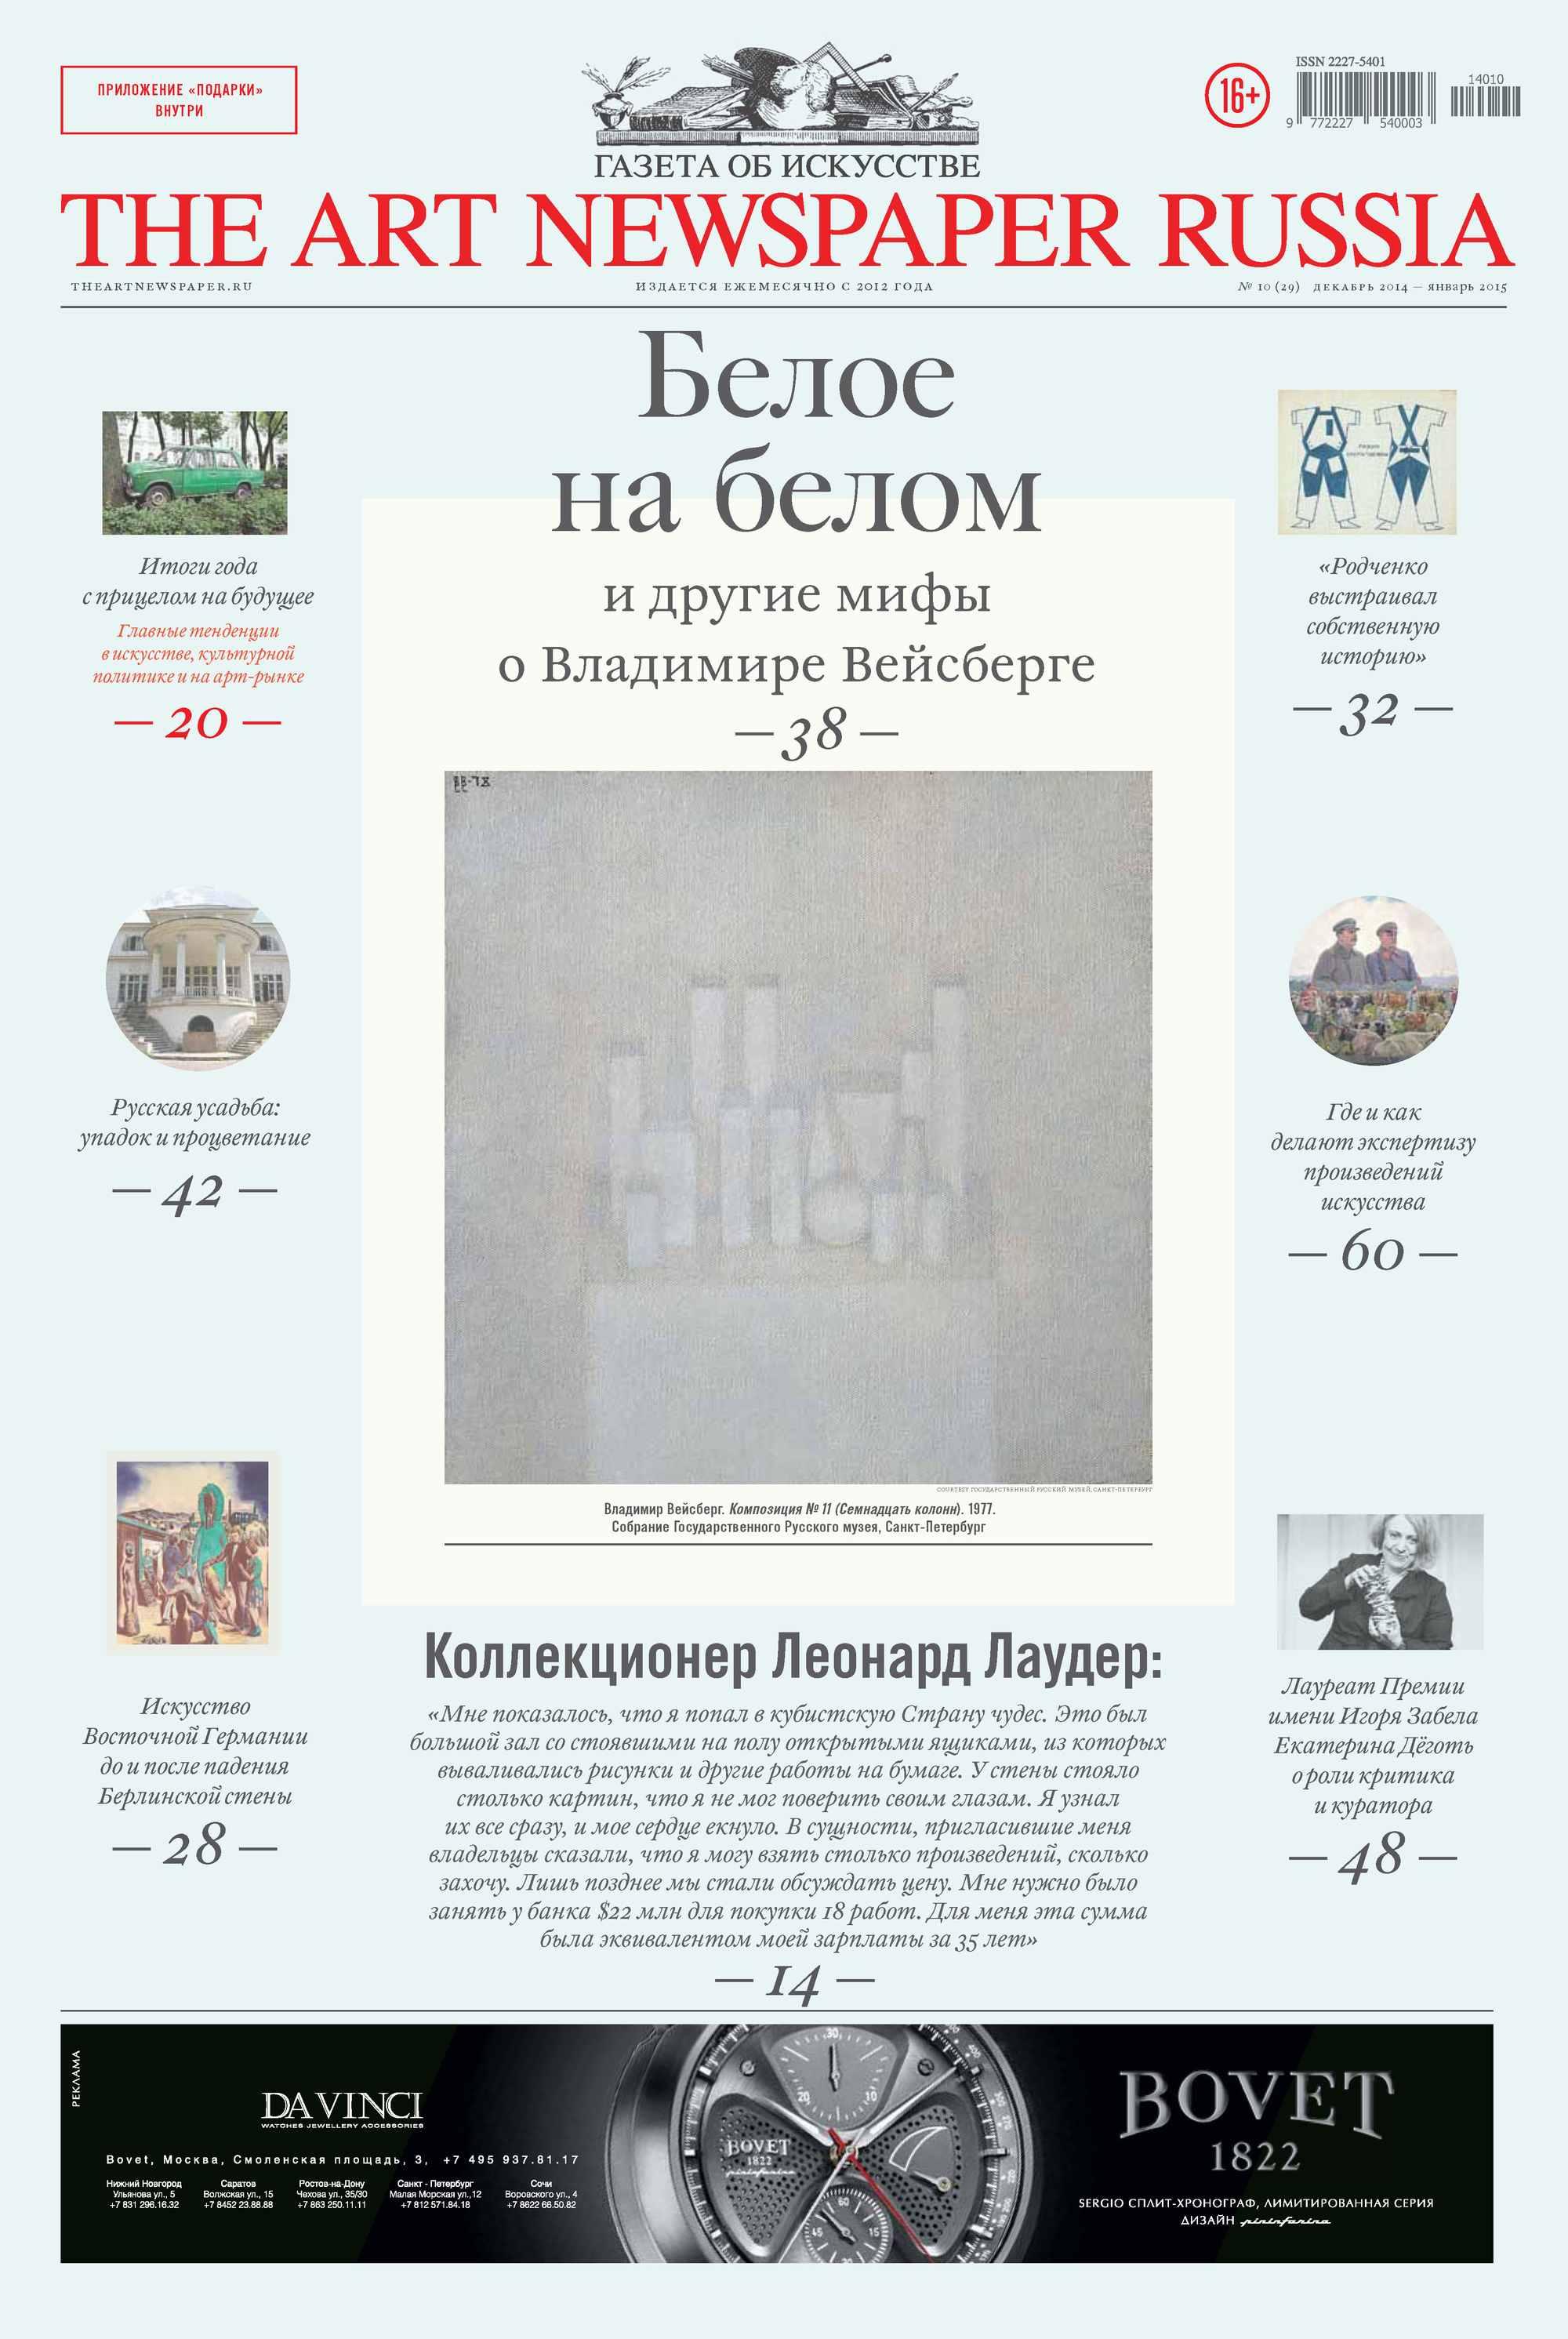 Отсутствует The Art Newspaper Russia №10 / декабрь 2014 – январь 2015 отсутствует the art newspaper russia 10 декабрь 2013 – январь 2014